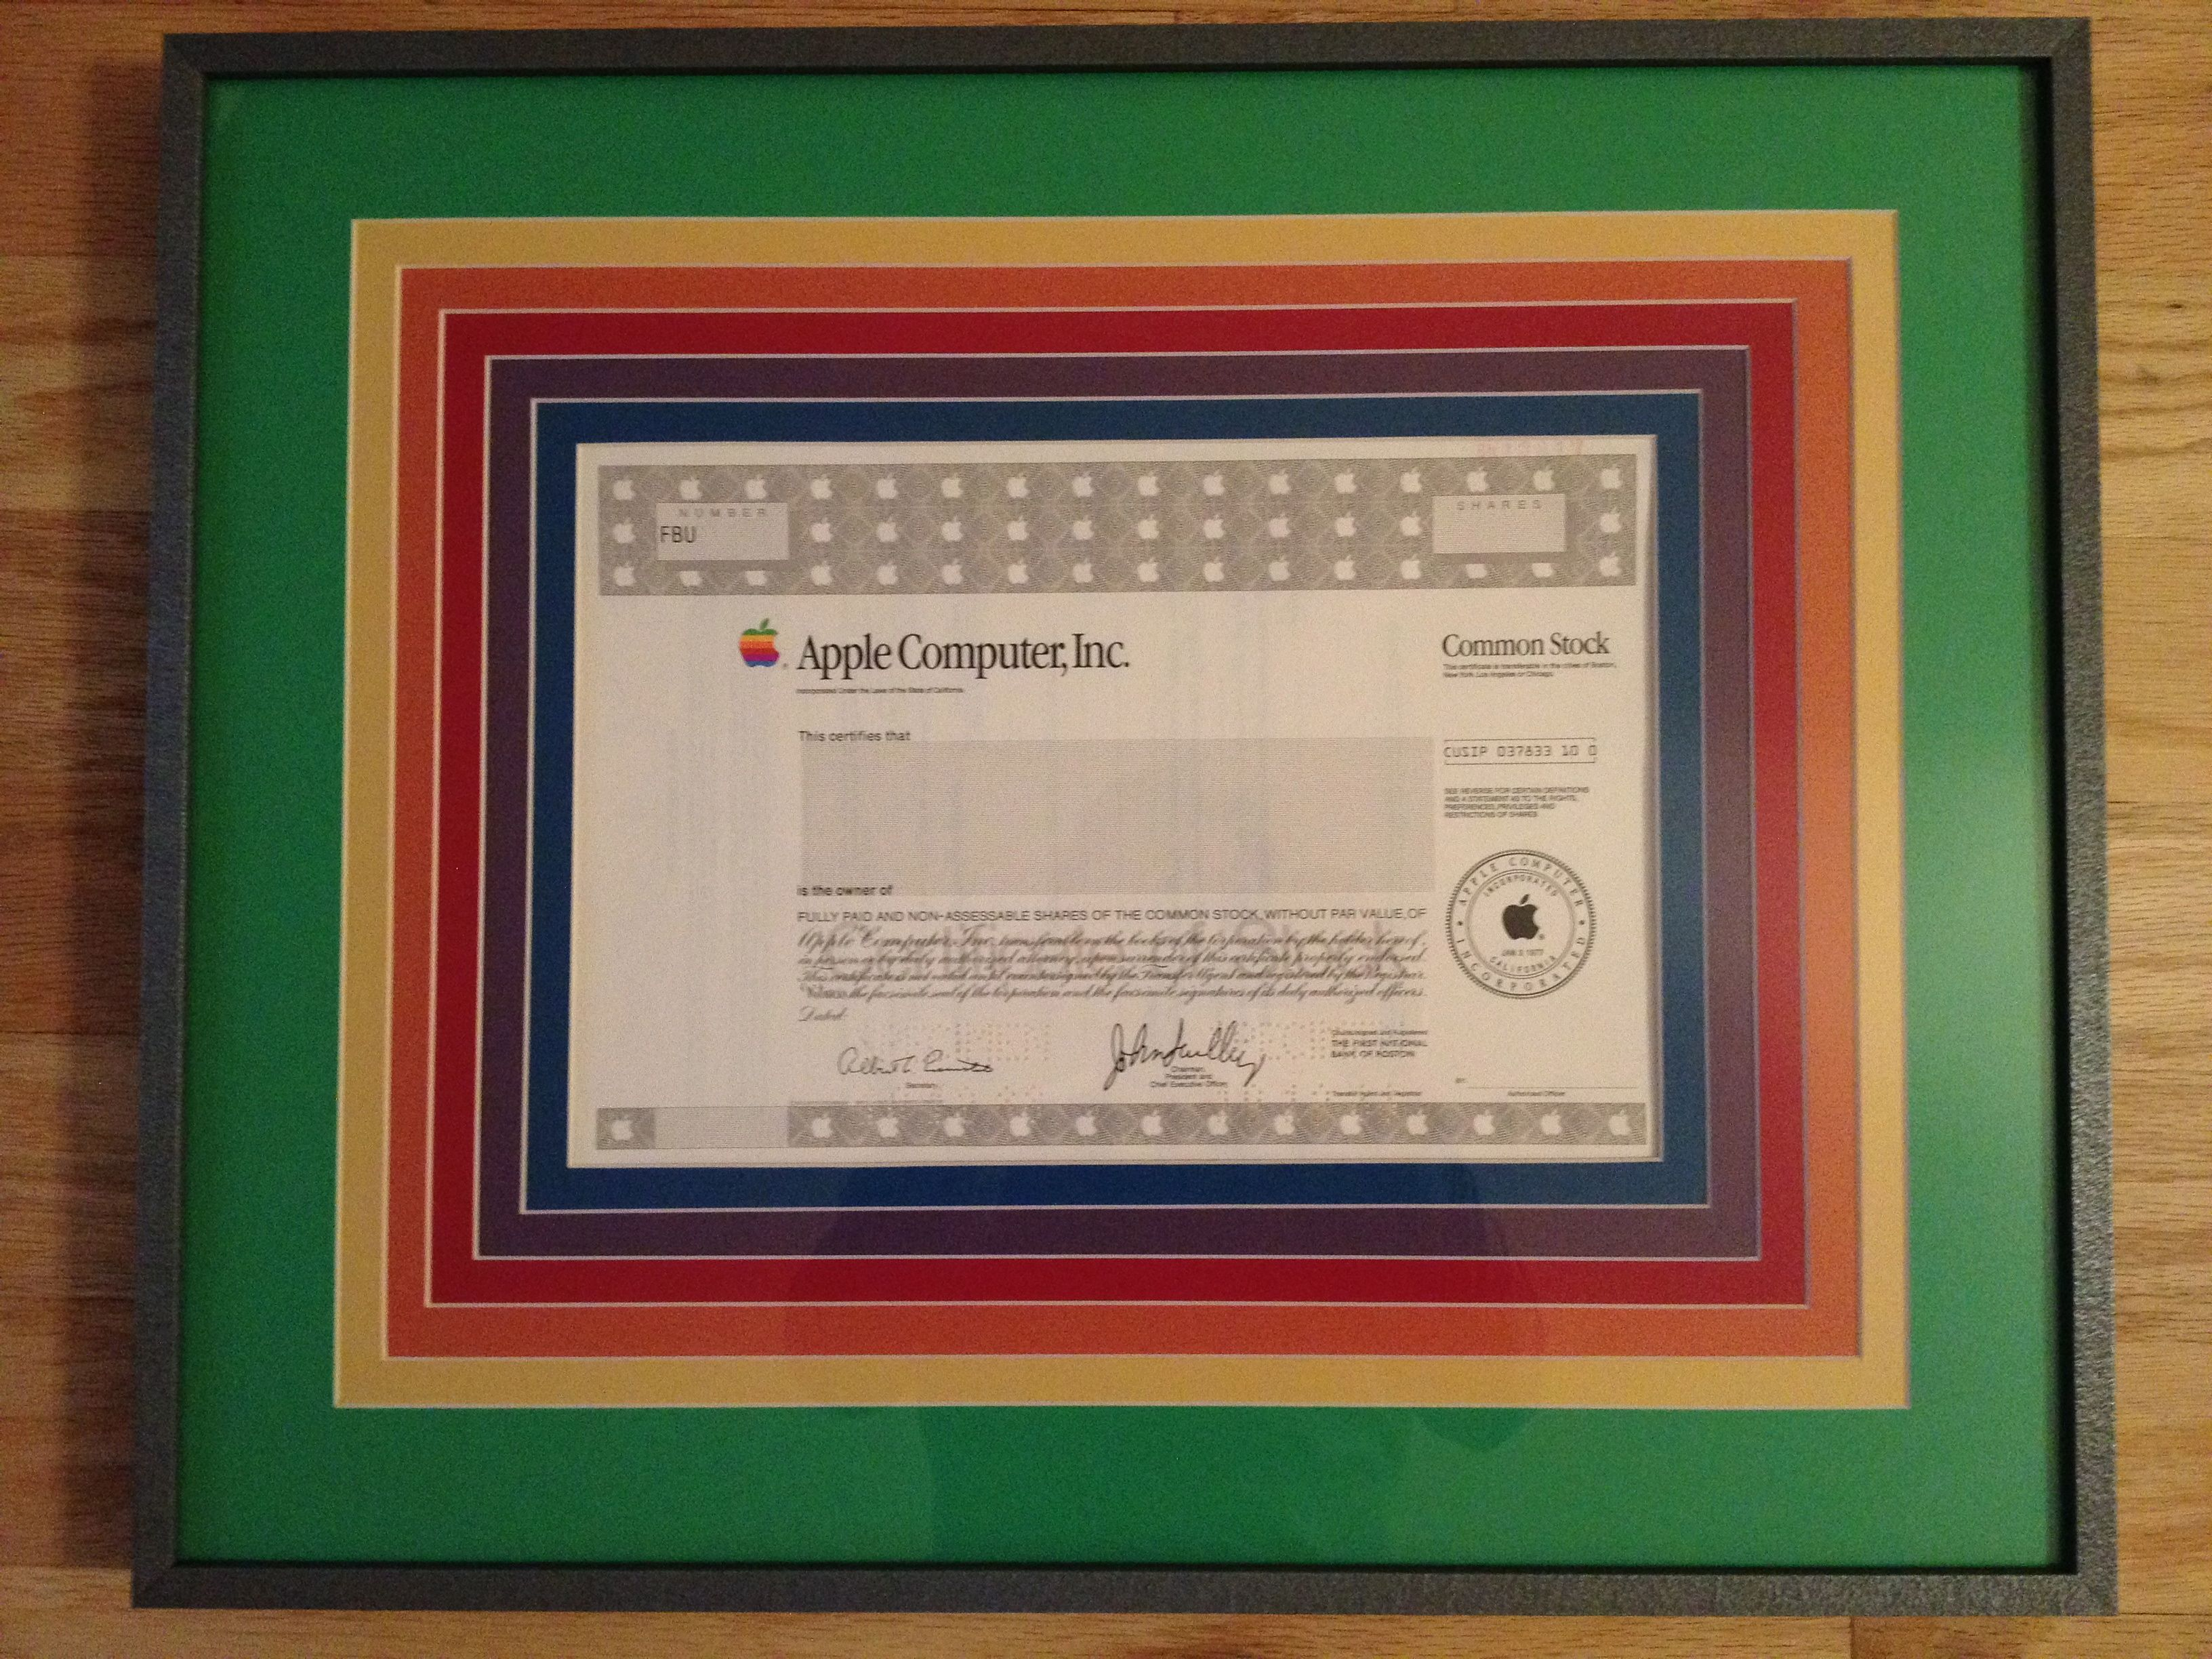 Apple Specimen stock certificate signed by John Sculley